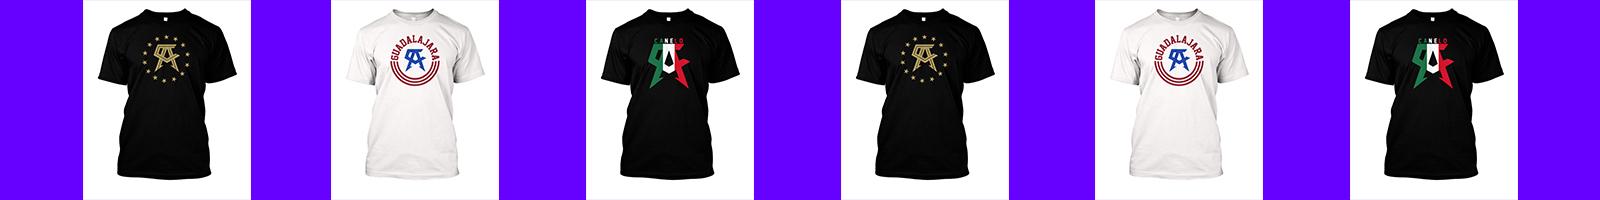 Canelo Alvarez T Shirts